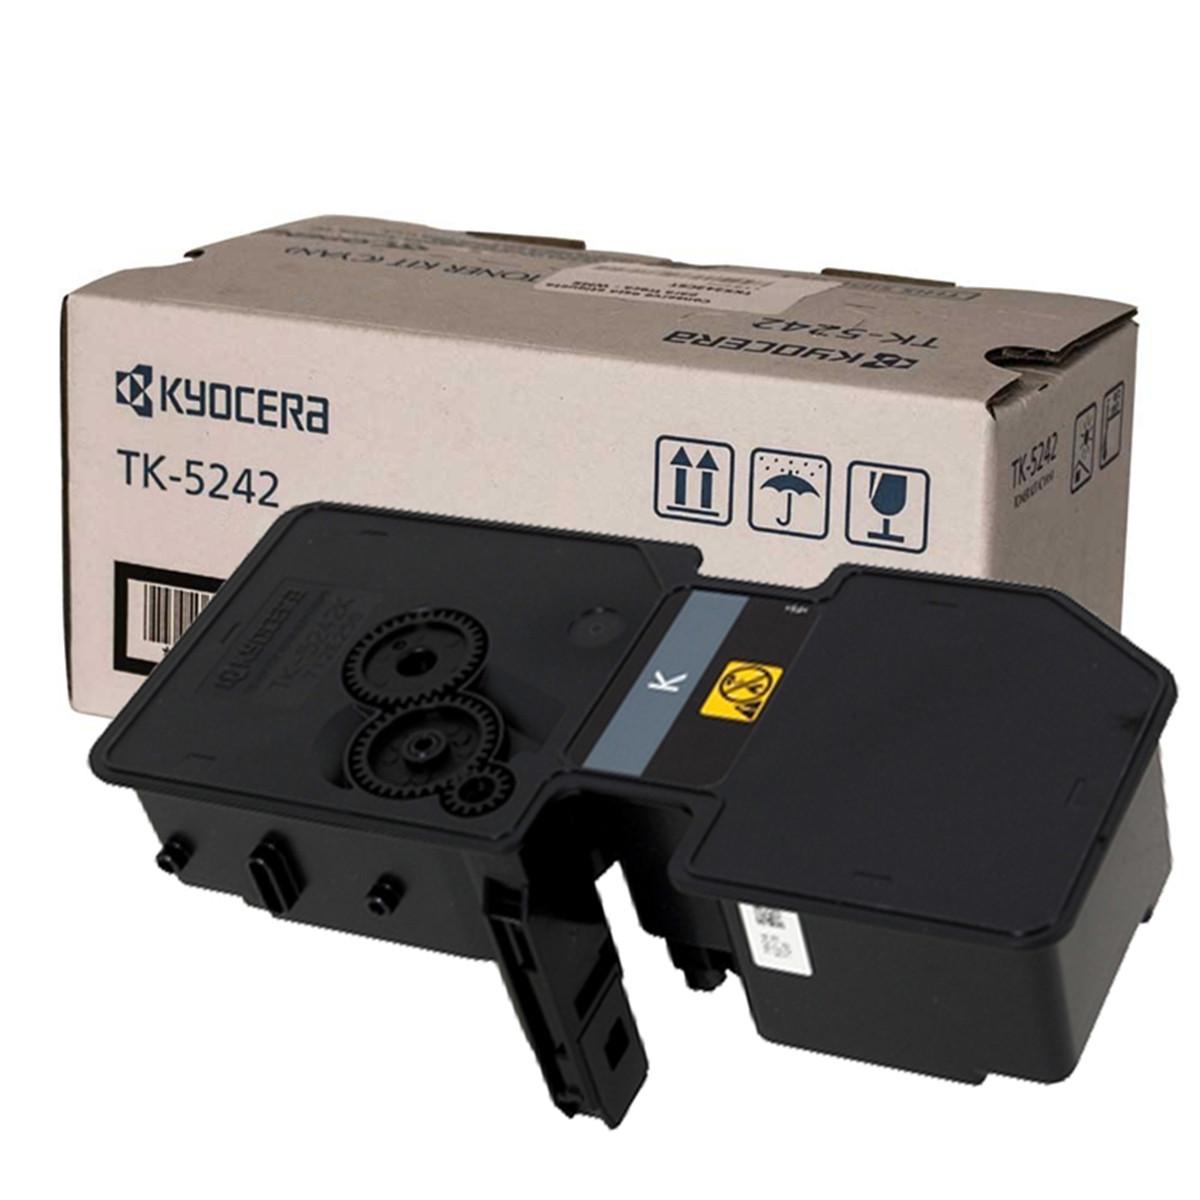 Toner Kyocera TK 5242K Preto   M5526CDW P5026CDN M5526 P5026 5526CDW 5026CDN 5526 5026   Original 4k